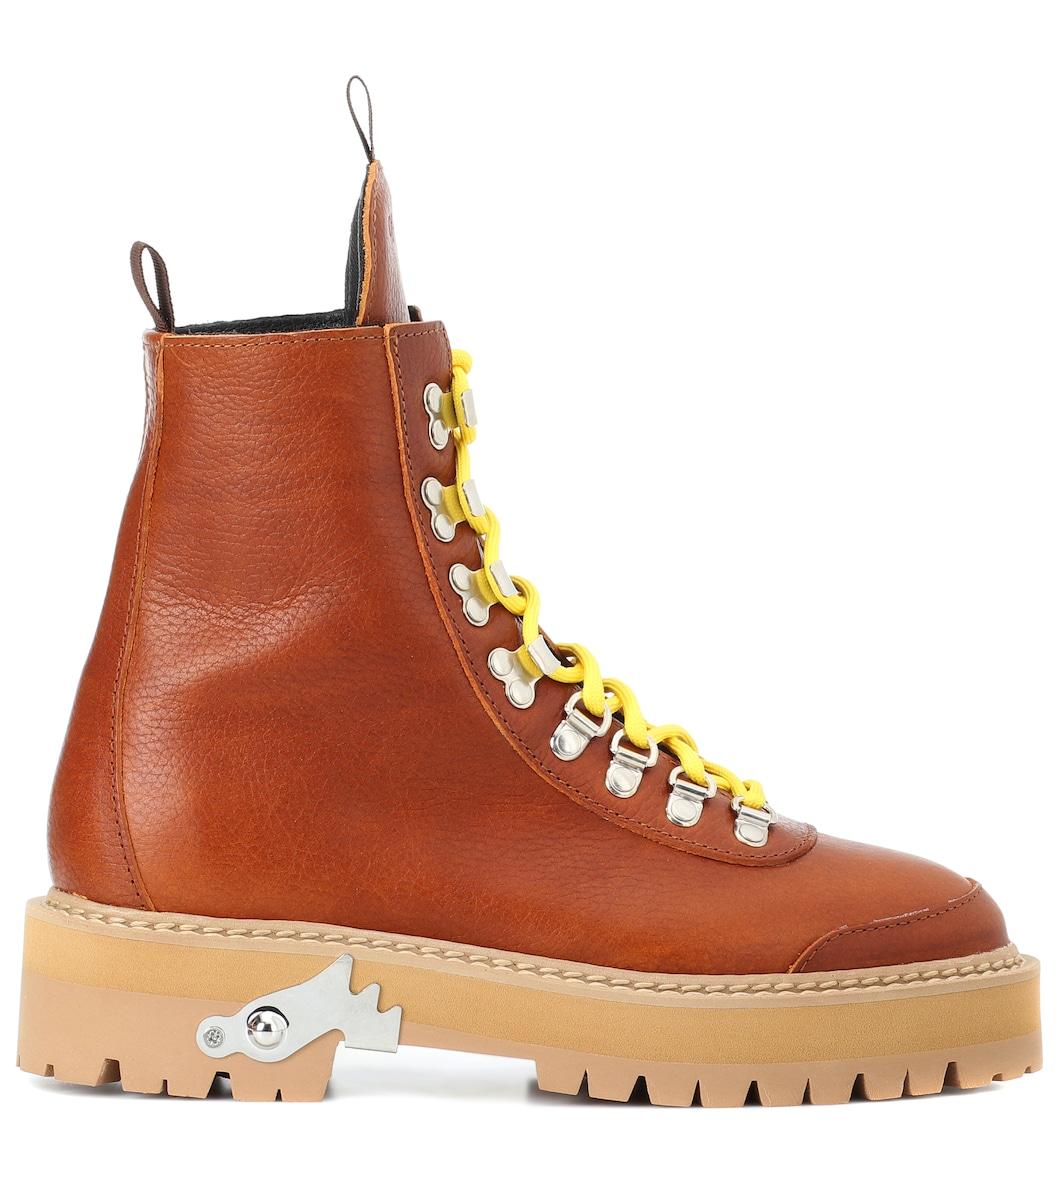 6531b460b8f Off-White - Leather hiking boots   Mytheresa